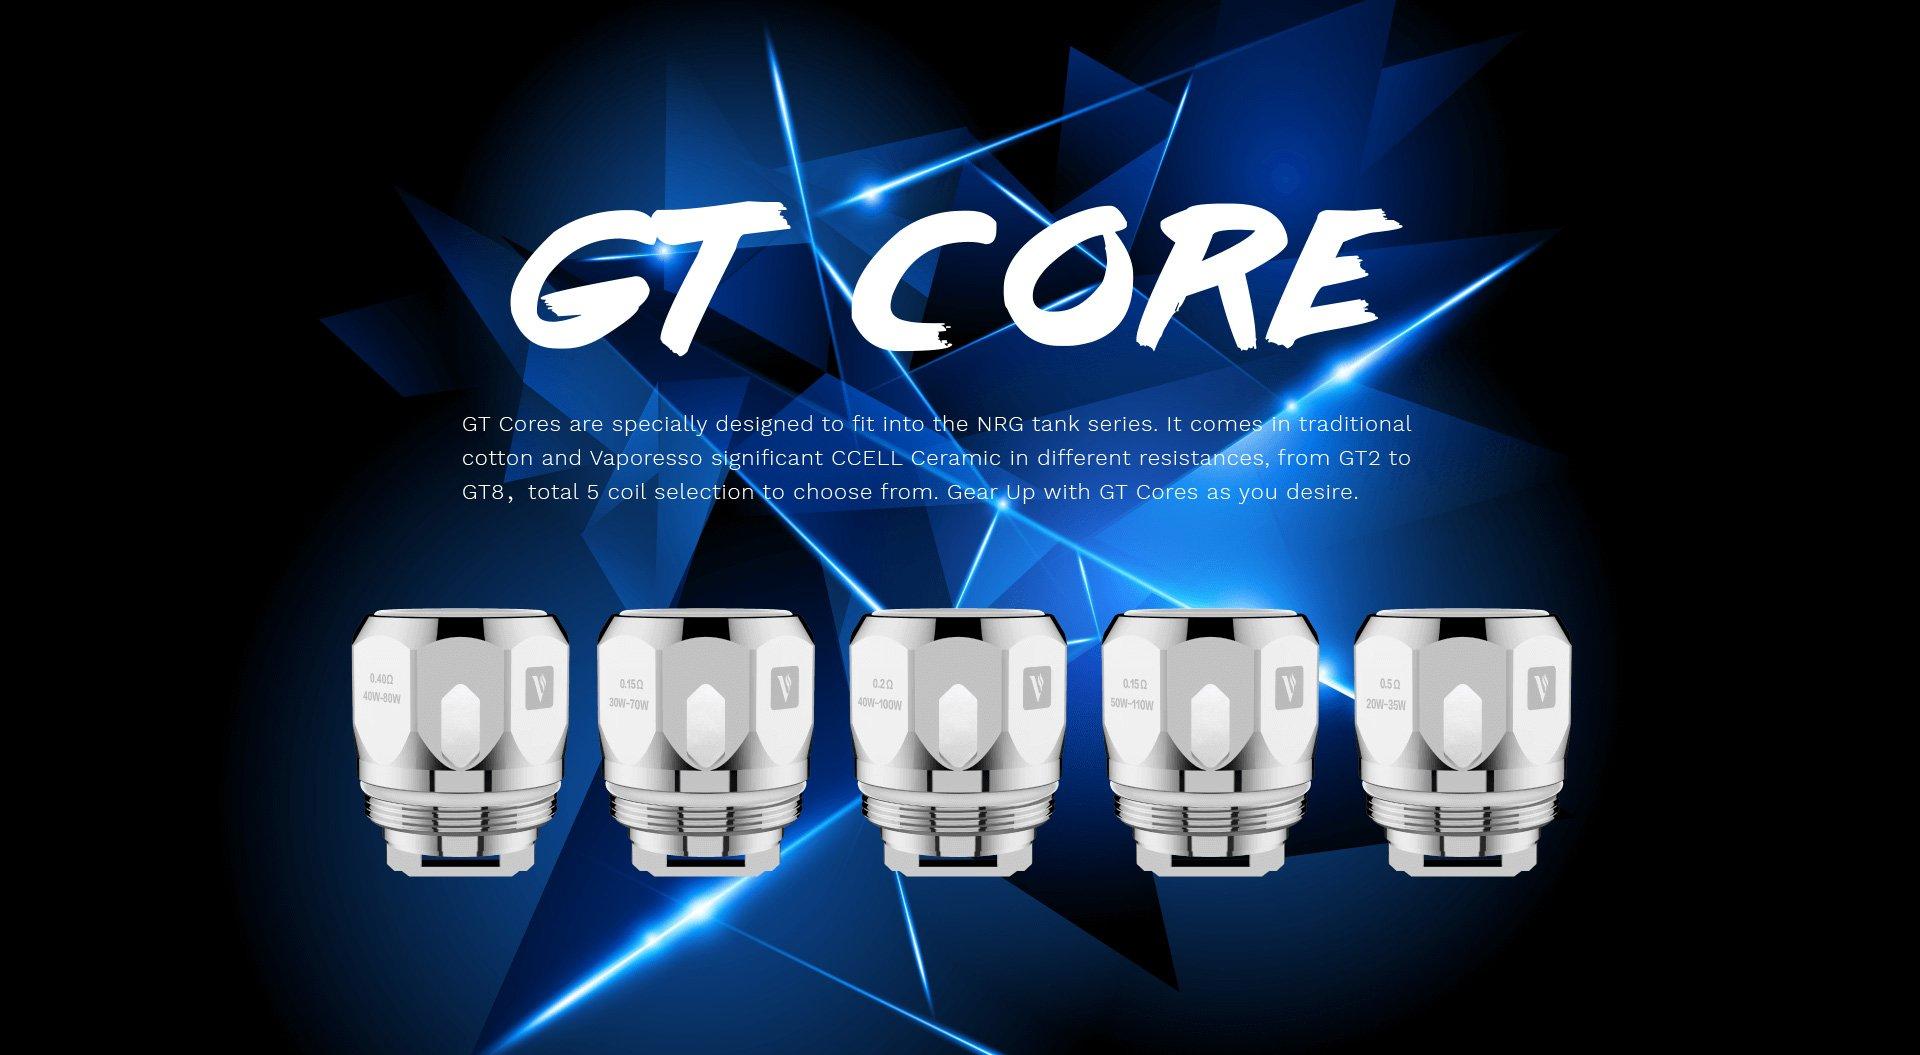 GT_Core_S1_vaporesso.jpg